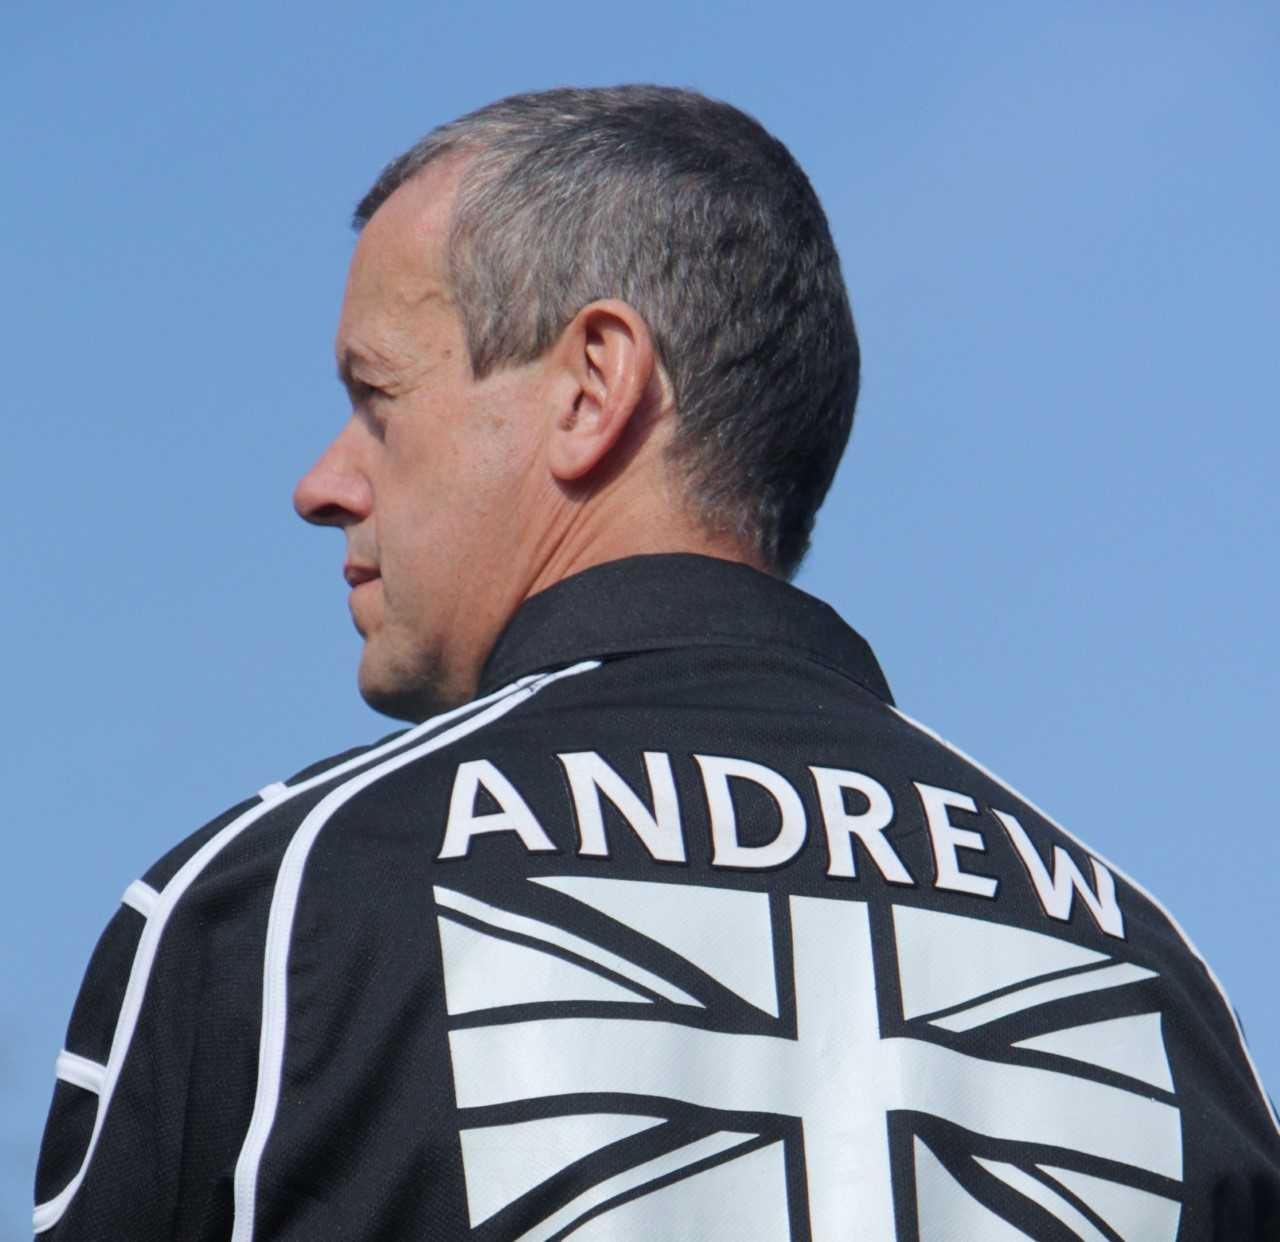 Andrew Fryer